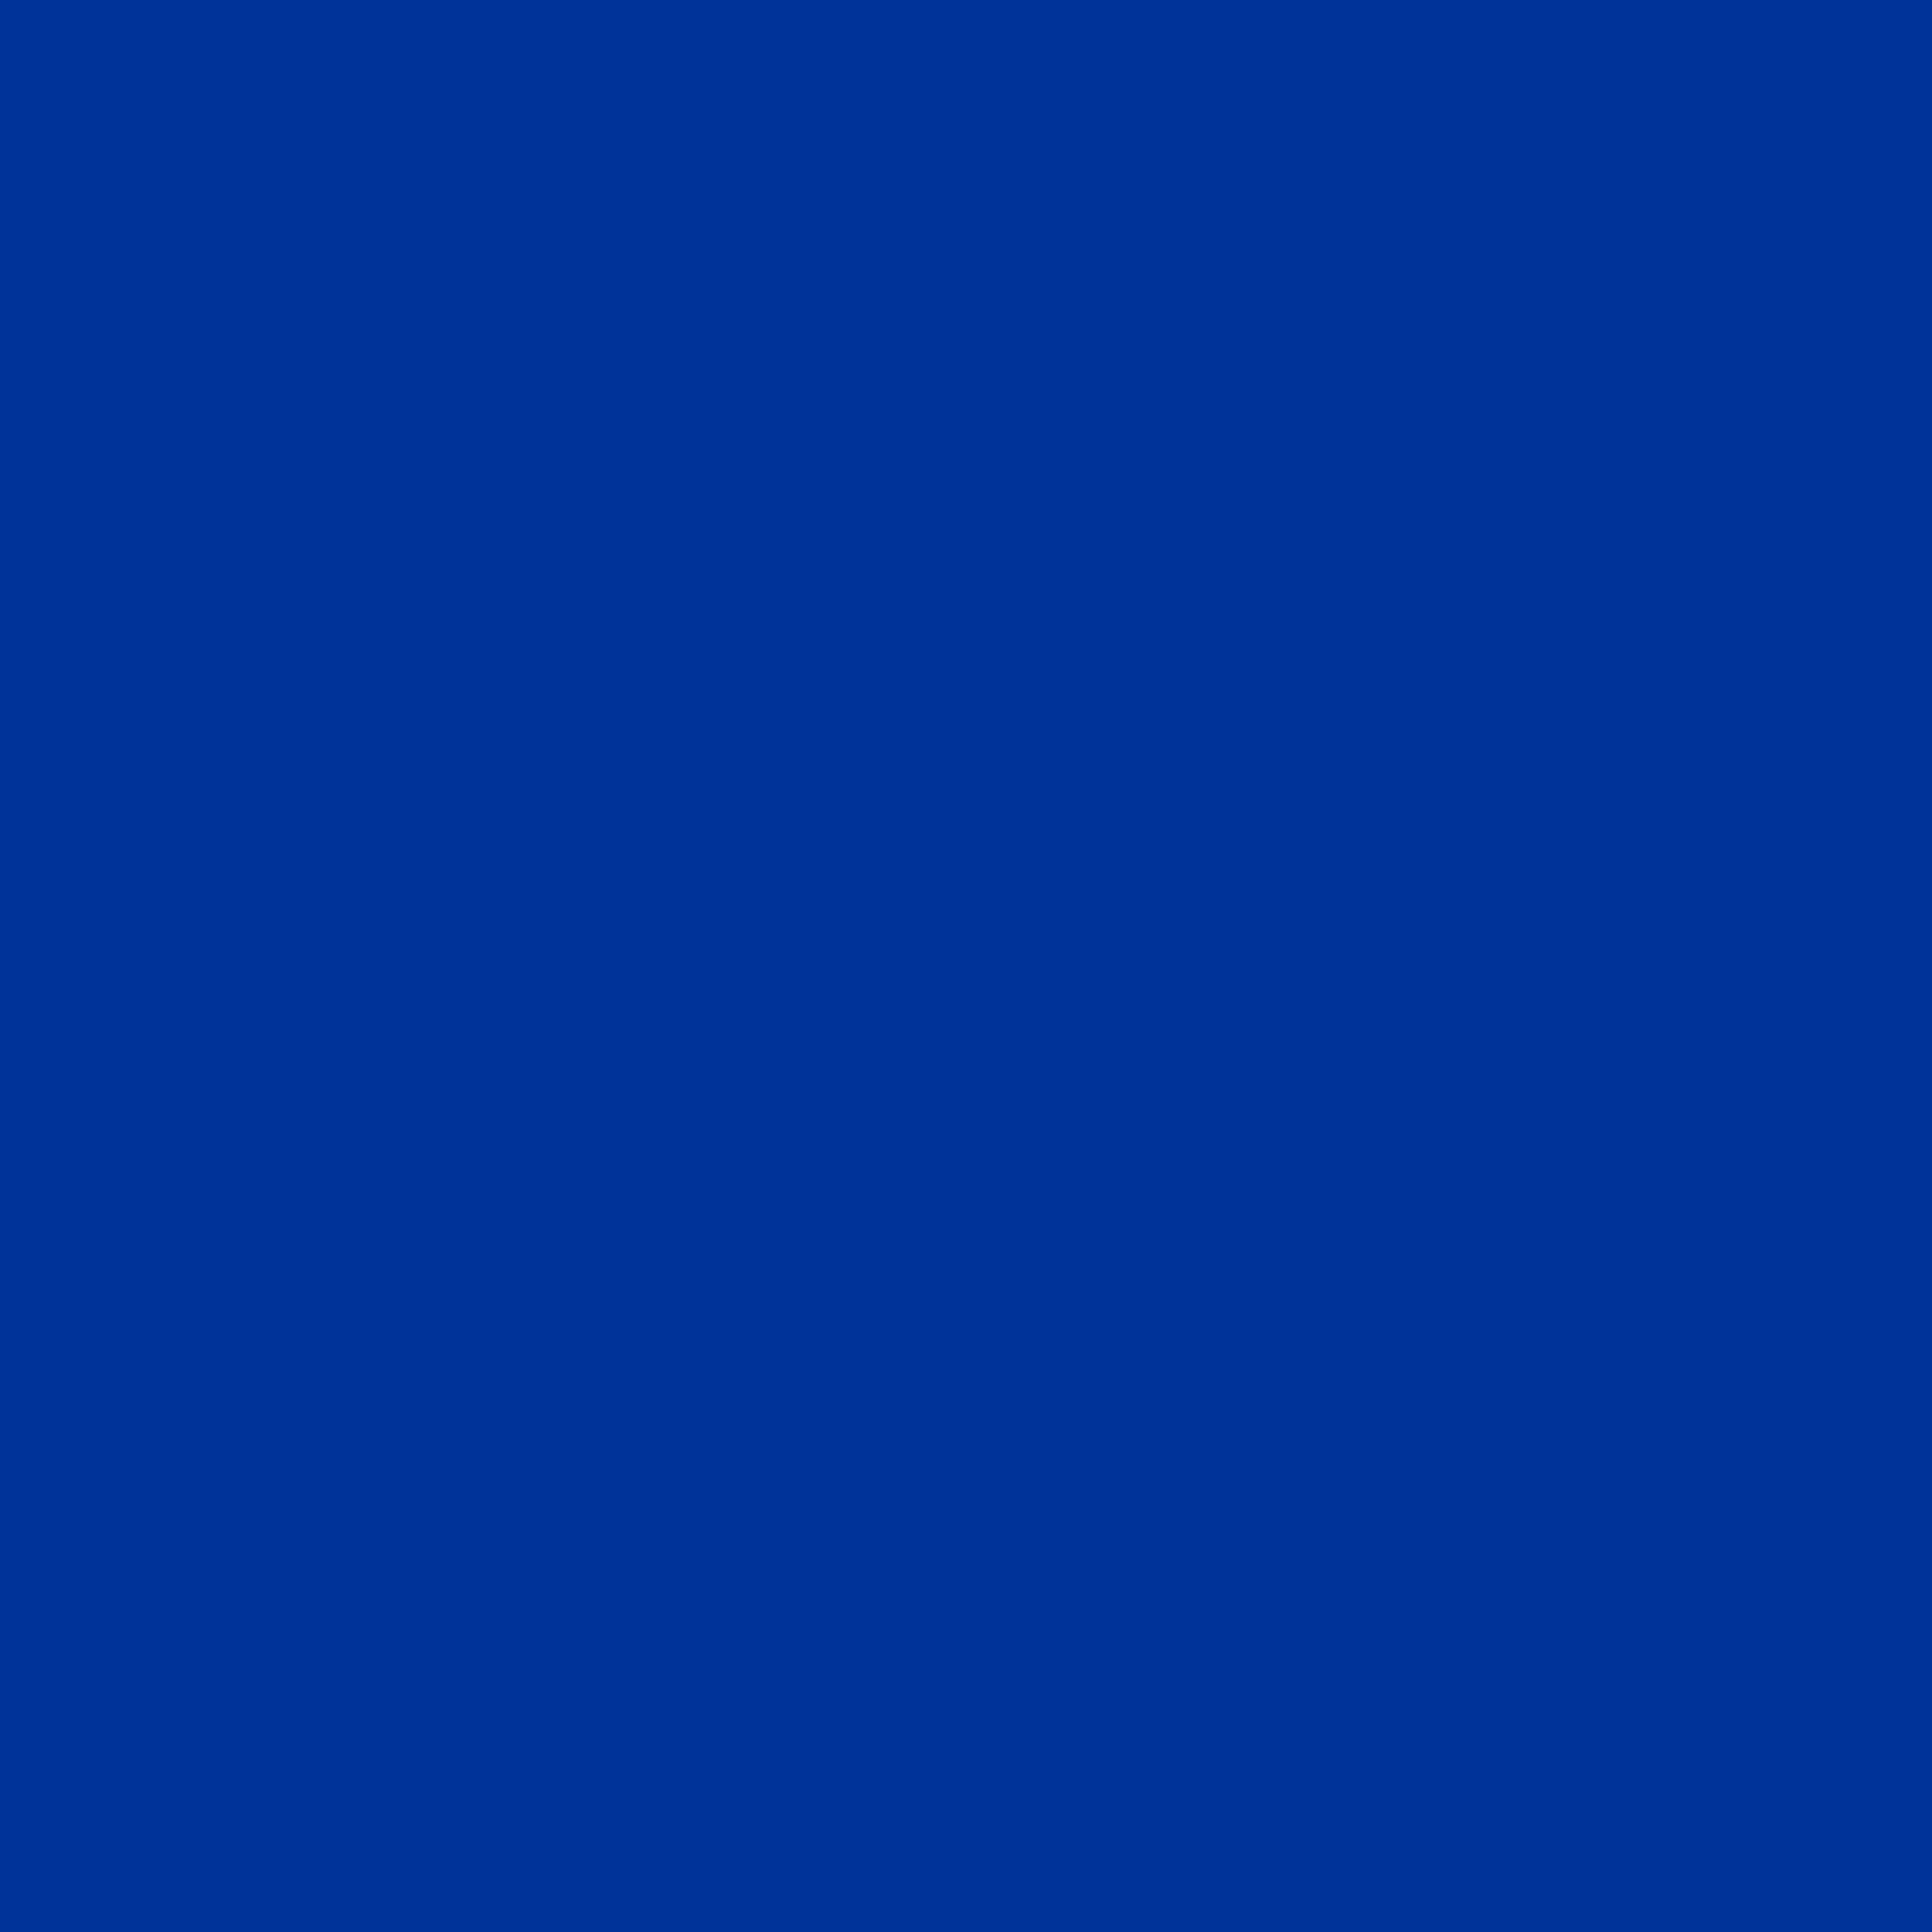 2732x2732 Smalt Dark Powder Blue Solid Color Background